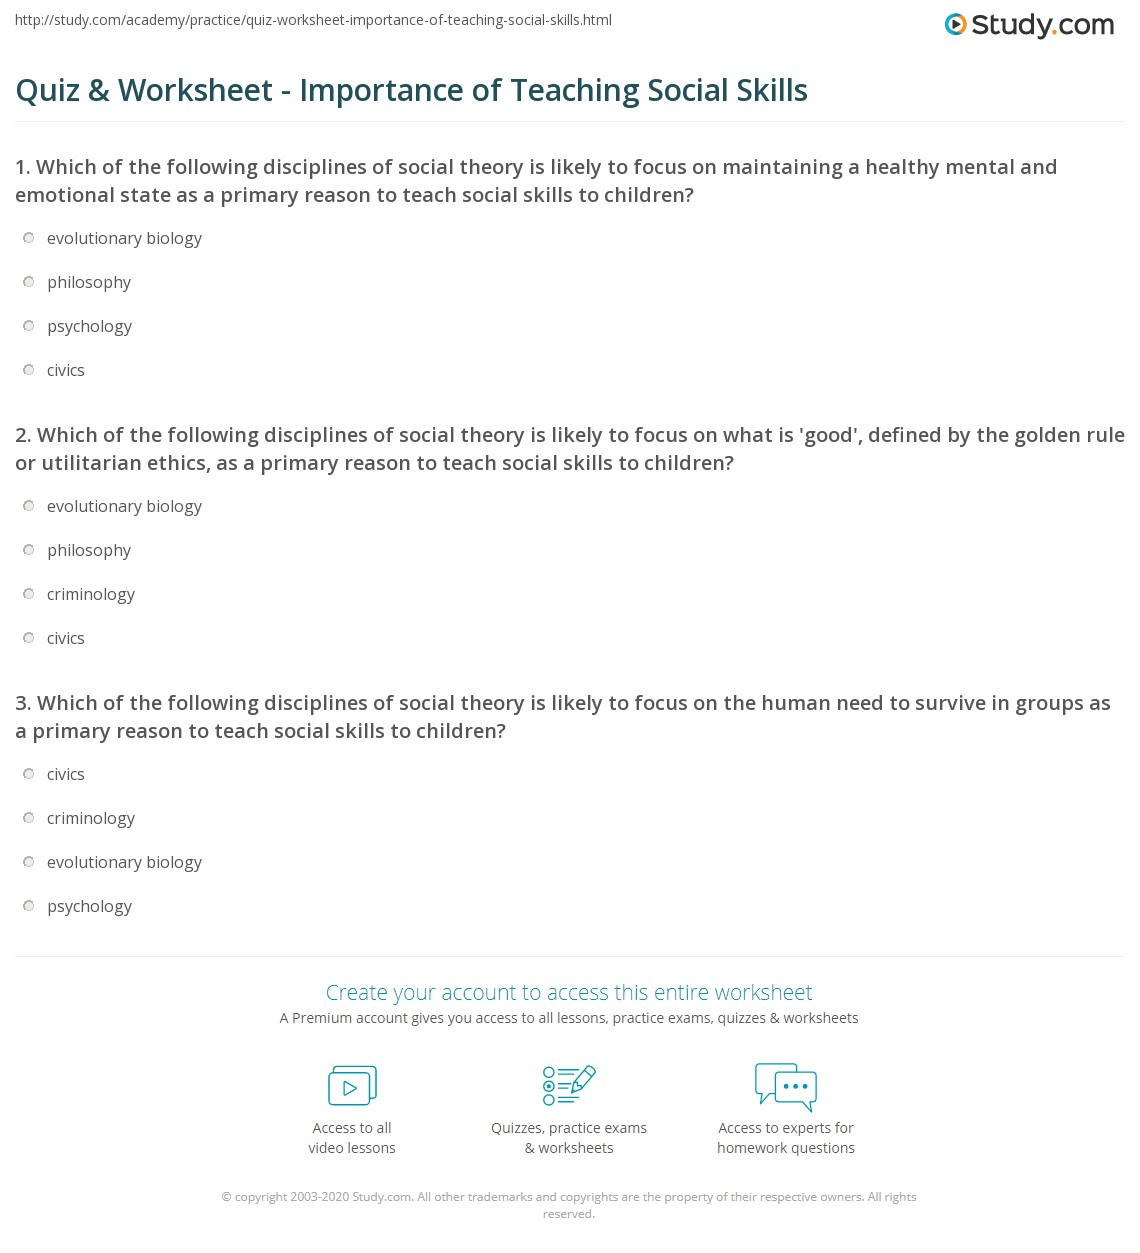 worksheet Free Social Skills Worksheets interpersonal skills worksheets free library download quiz w ksheet imp t nce of te ch g ci l study